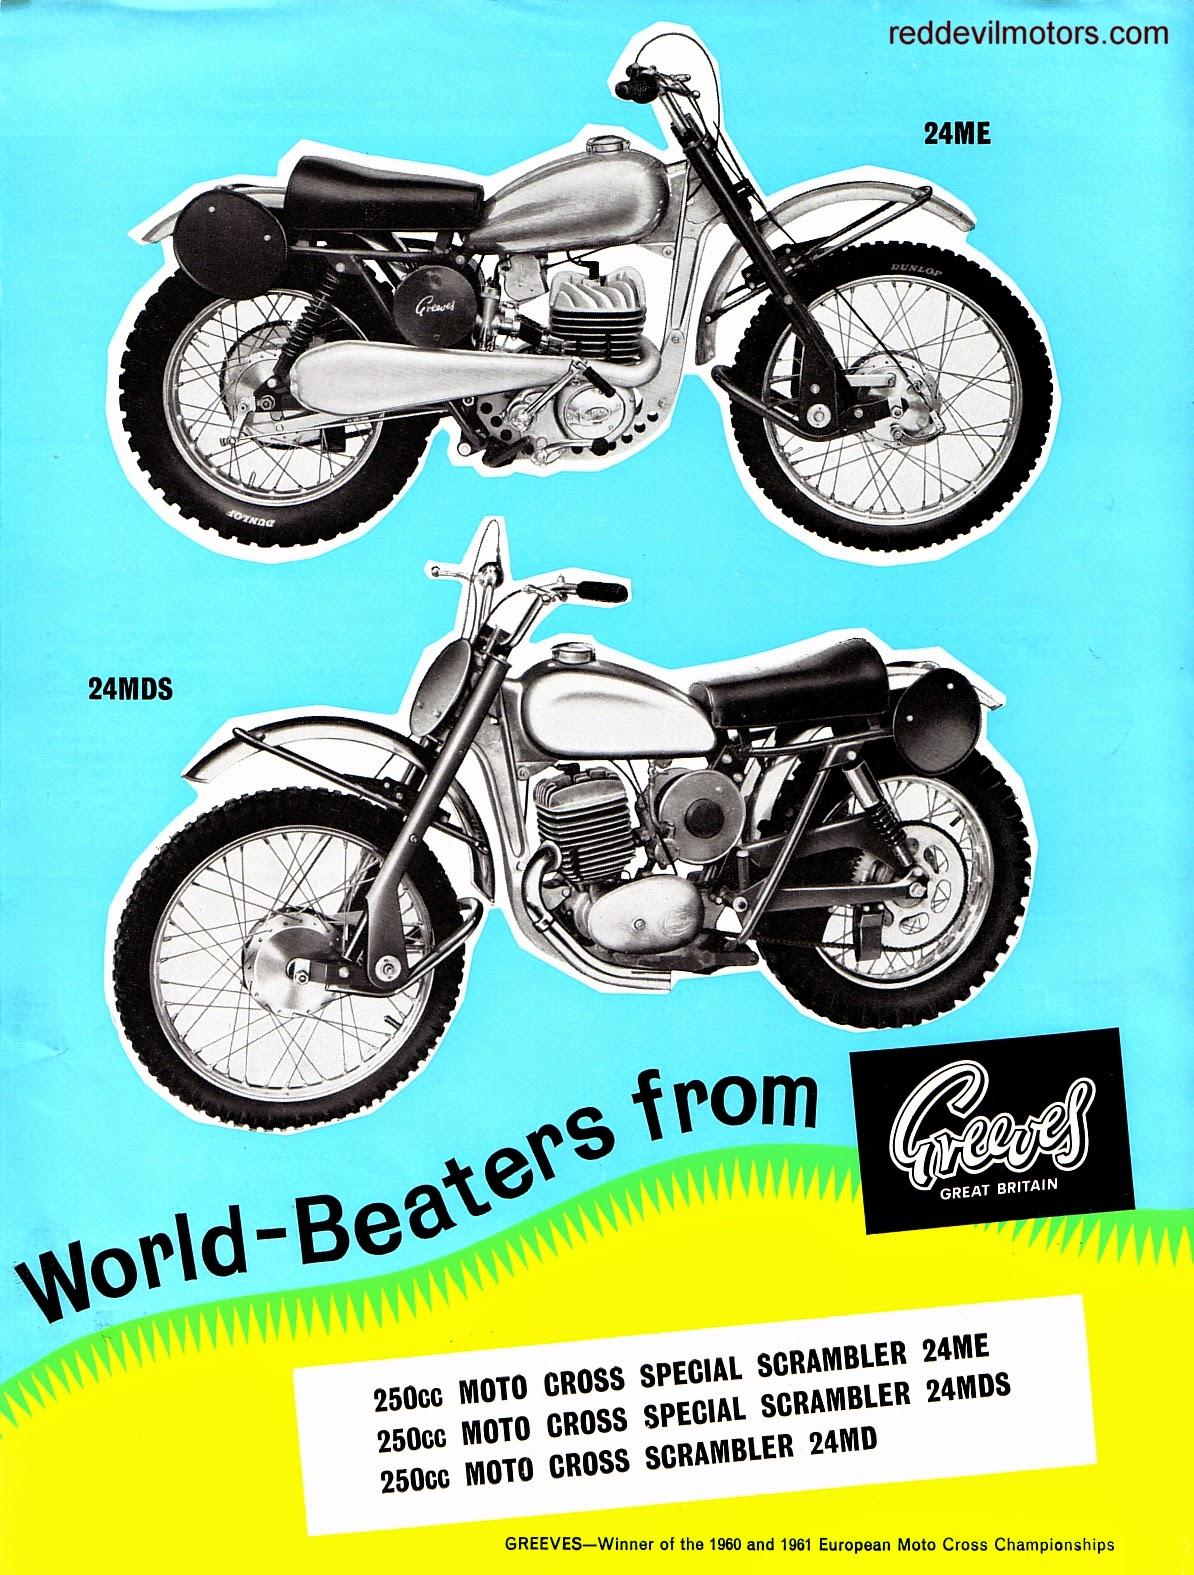 greeves scrambler me md mds 1963